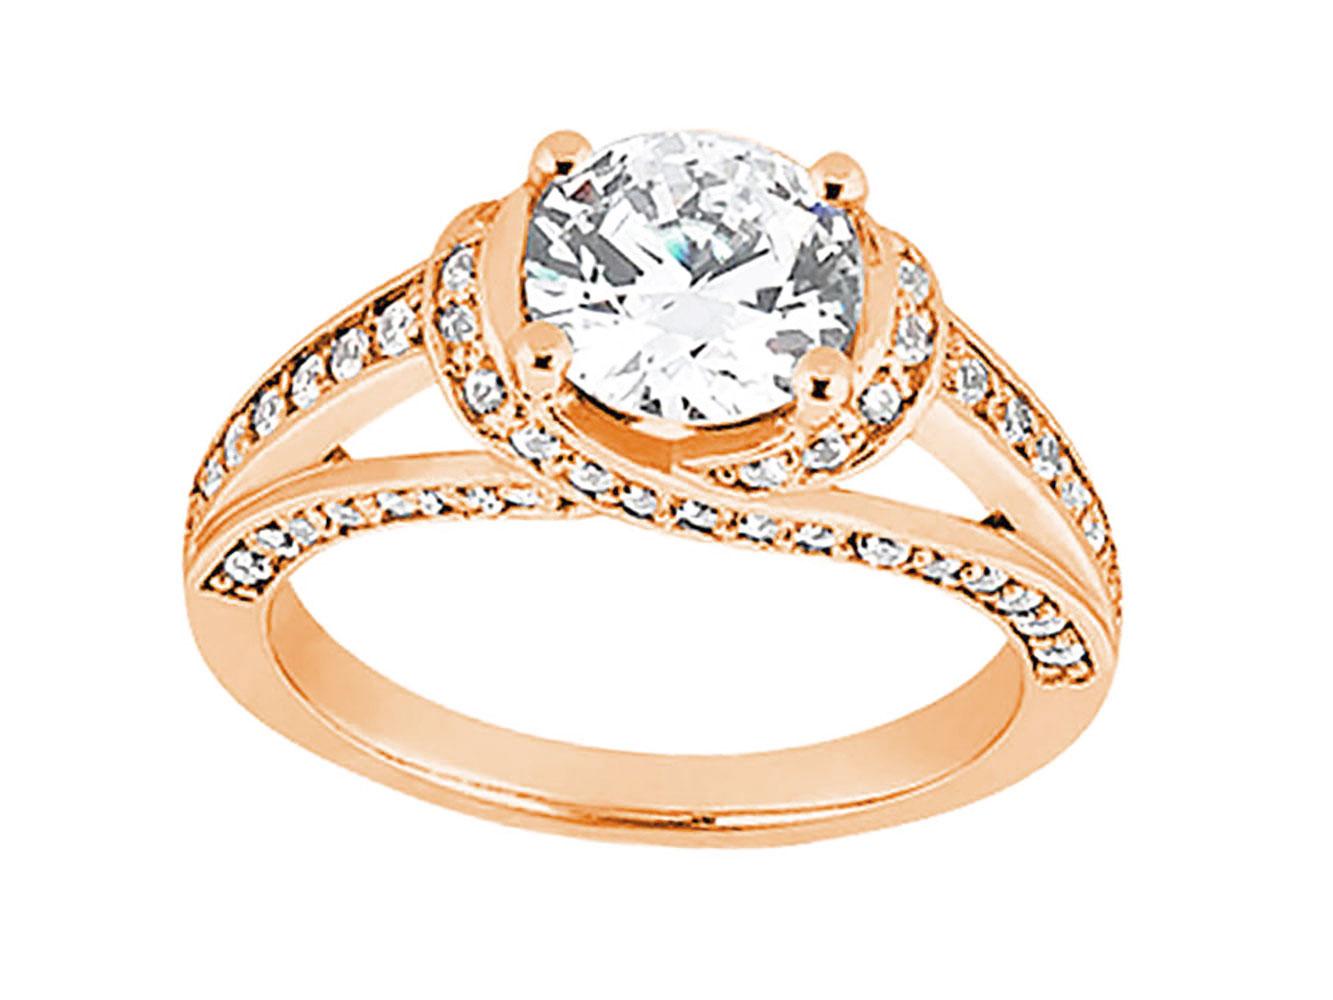 genuine round diamond engagement ring solid 14k rose white yellow gold ebay. Black Bedroom Furniture Sets. Home Design Ideas